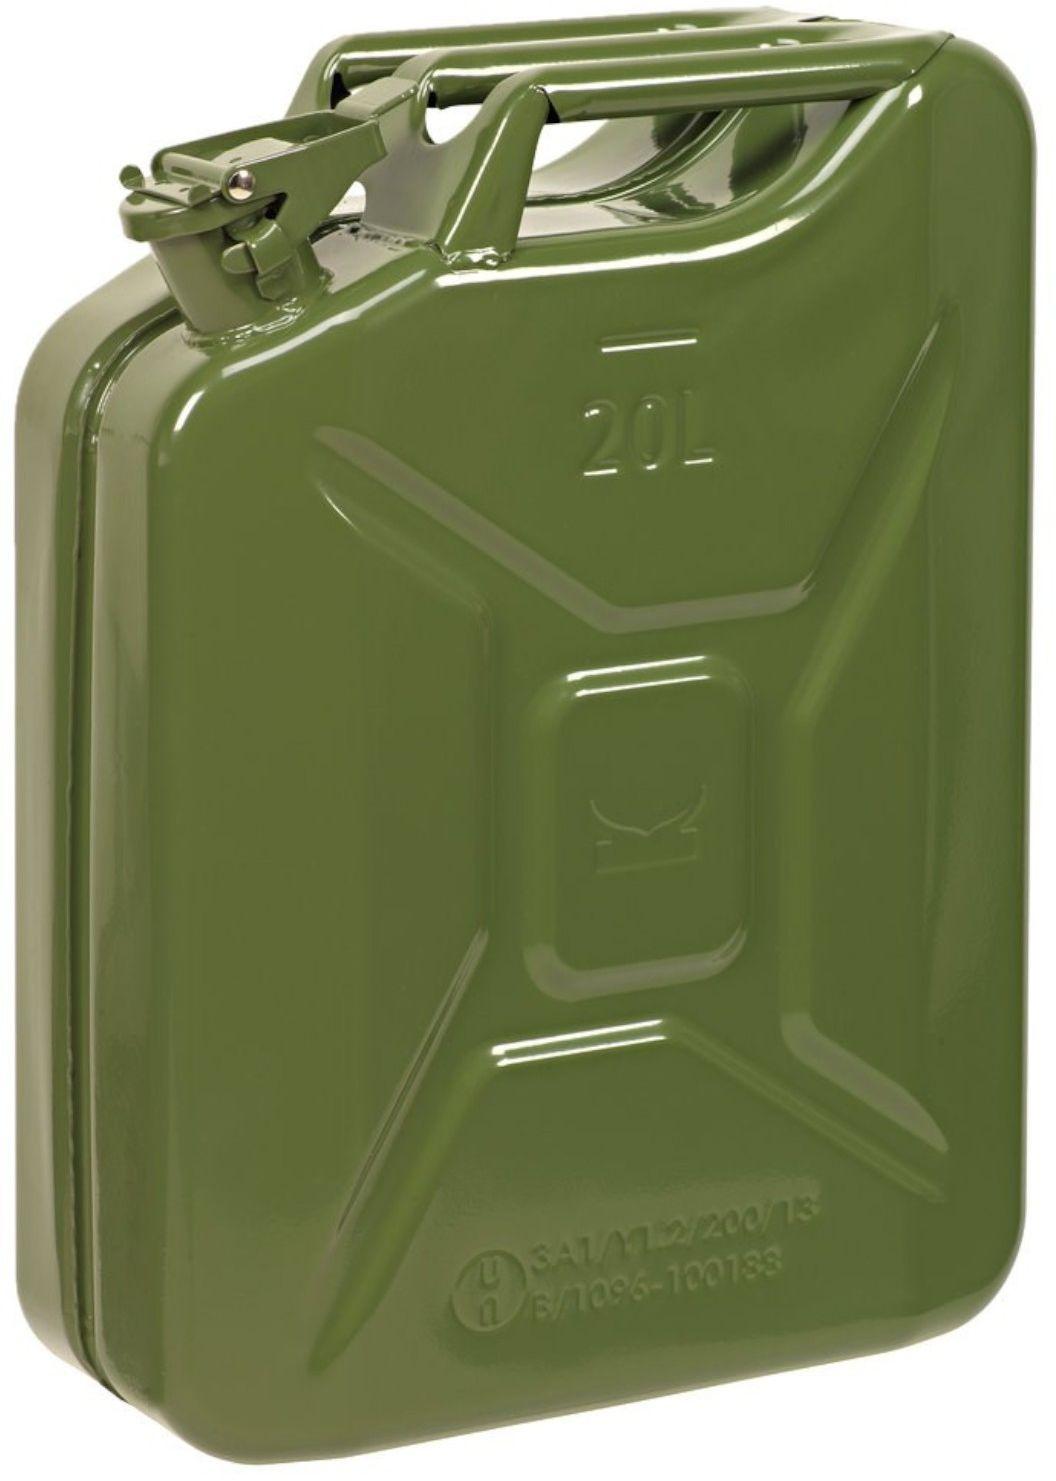 Kanister metalowy 20 l RAL- Certyfikat UN